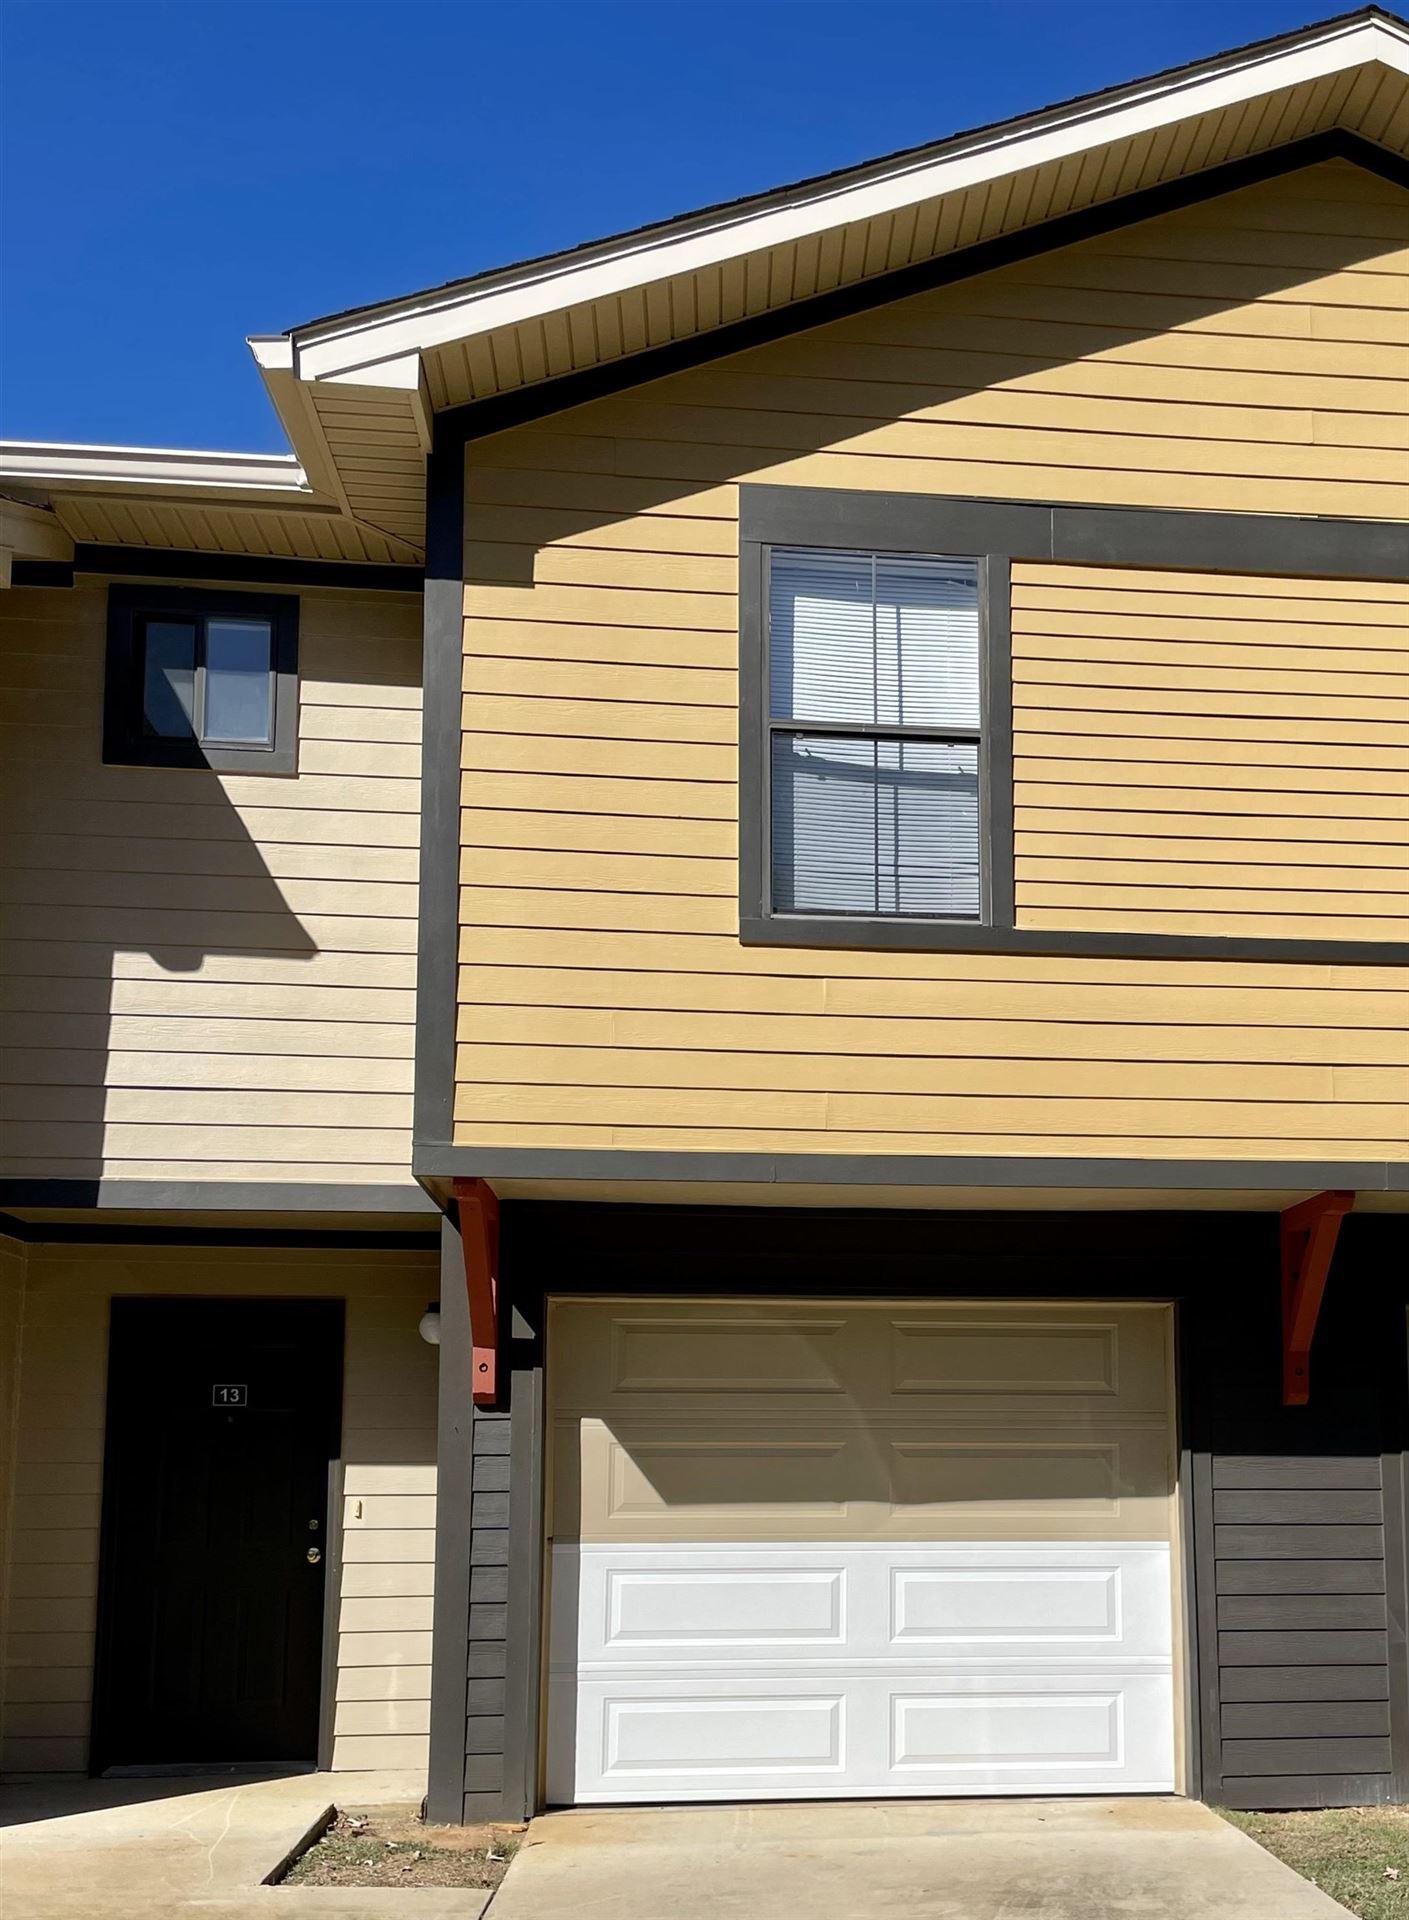 Photo of 741 White Drive #13, TALLAHASSEE, FL 32304 (MLS # 338707)